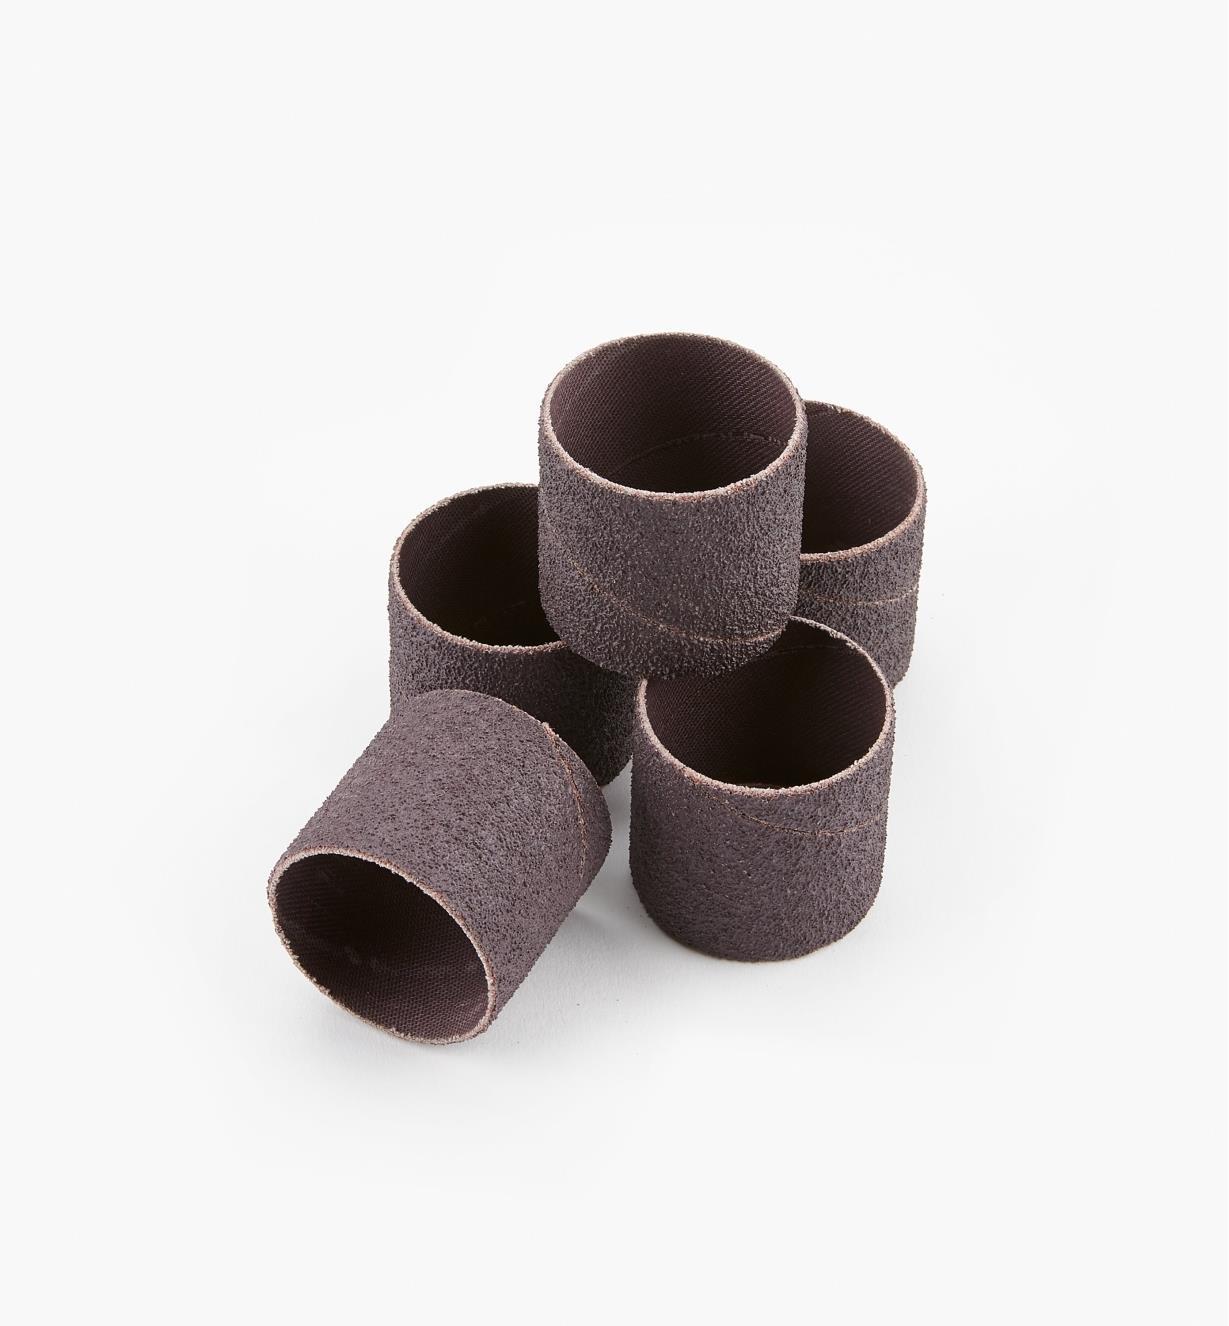 68Z0105C - Manchons gros grain, 11/2pox11/2po, lepaquetde5